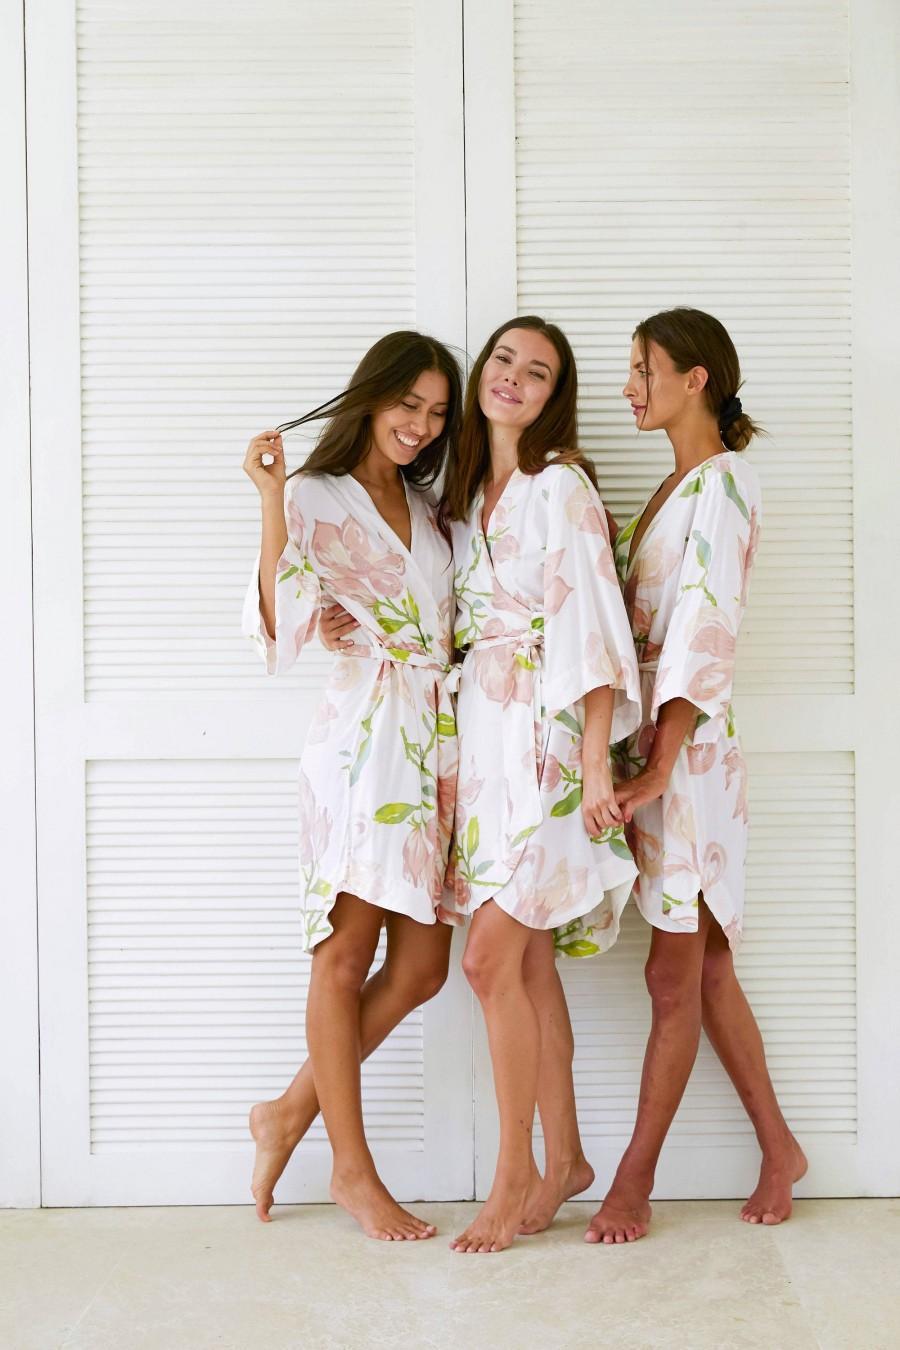 Hochzeit - Bridesmaid Robes, Bespoke Kimono Robe, Magnolia MIST, Code: P053 (B)